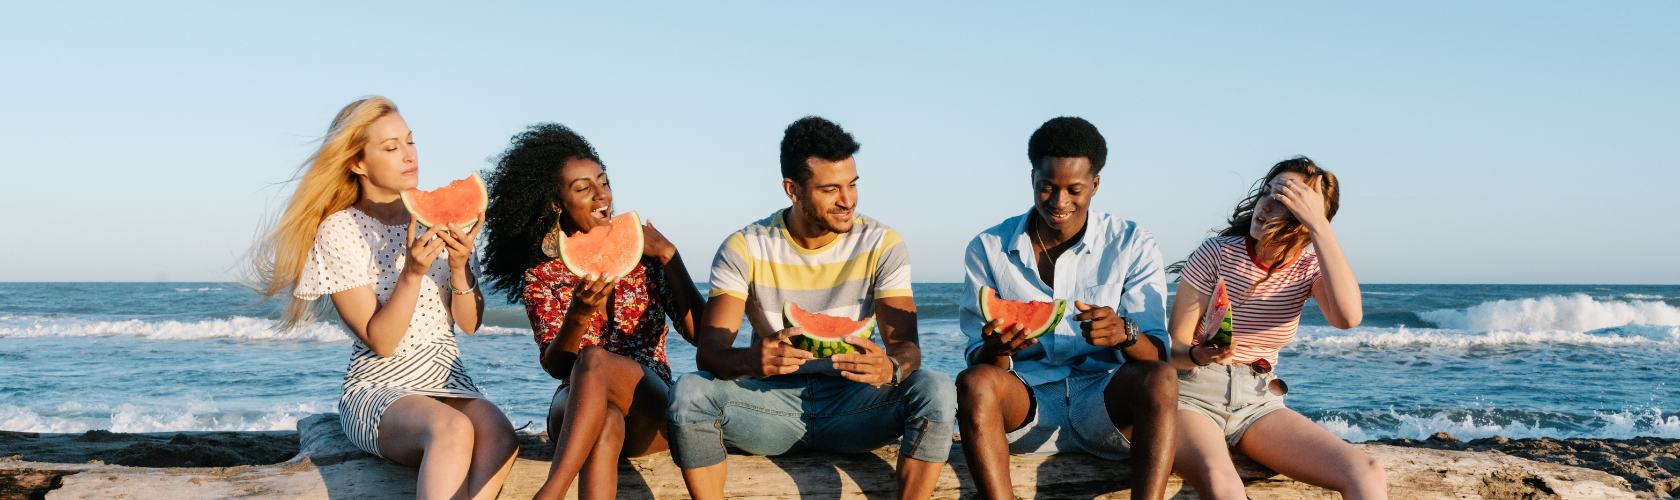 friends-on-beach-eating-watermelon